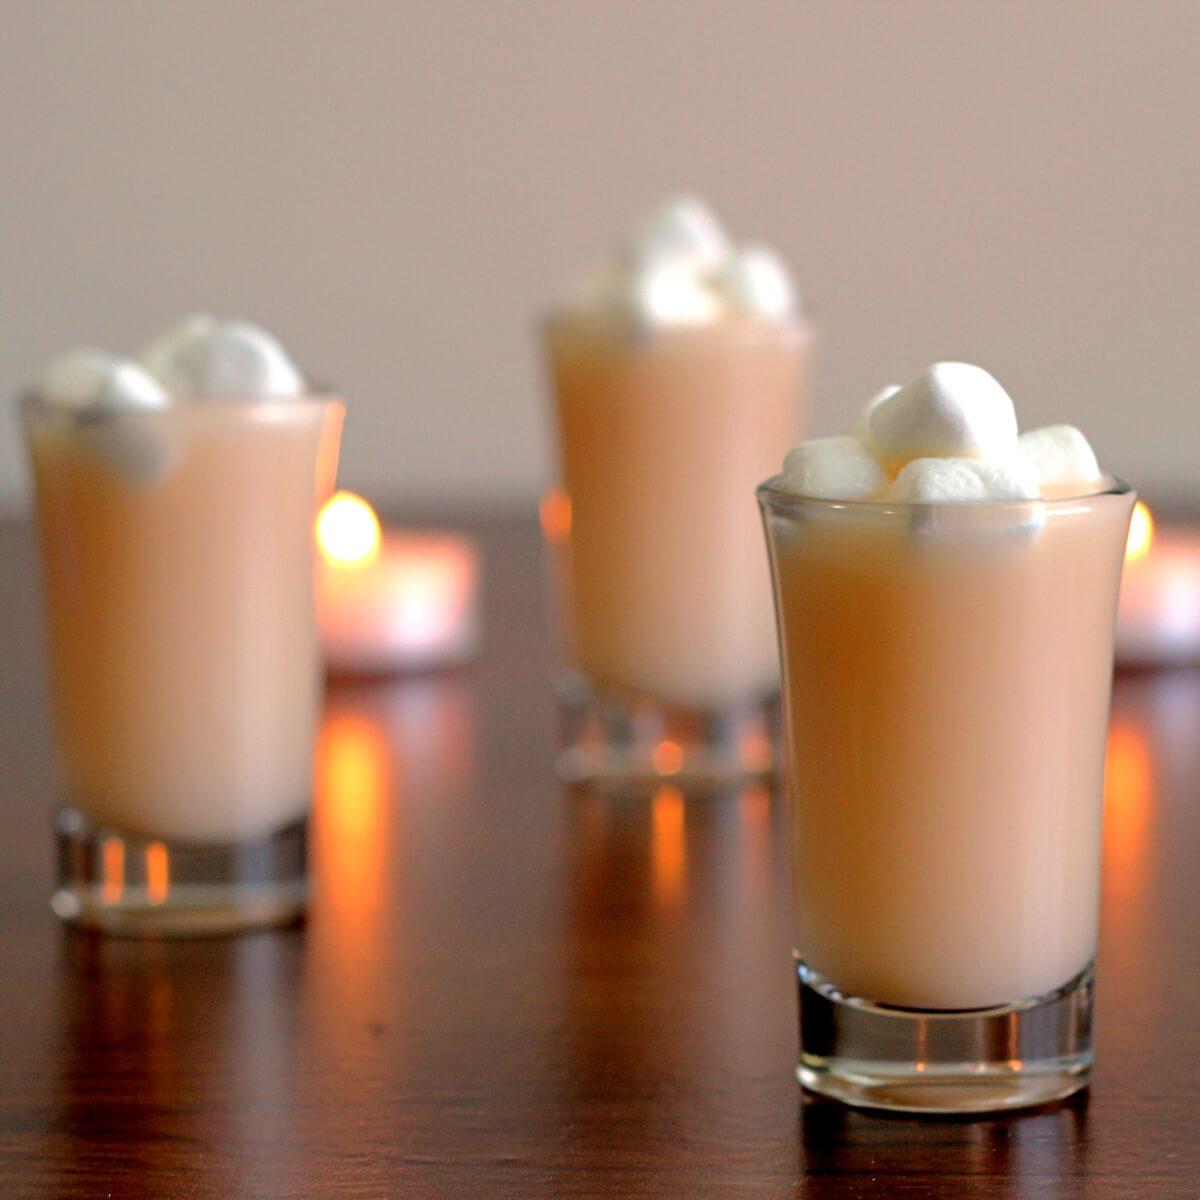 Marshmallow Shots